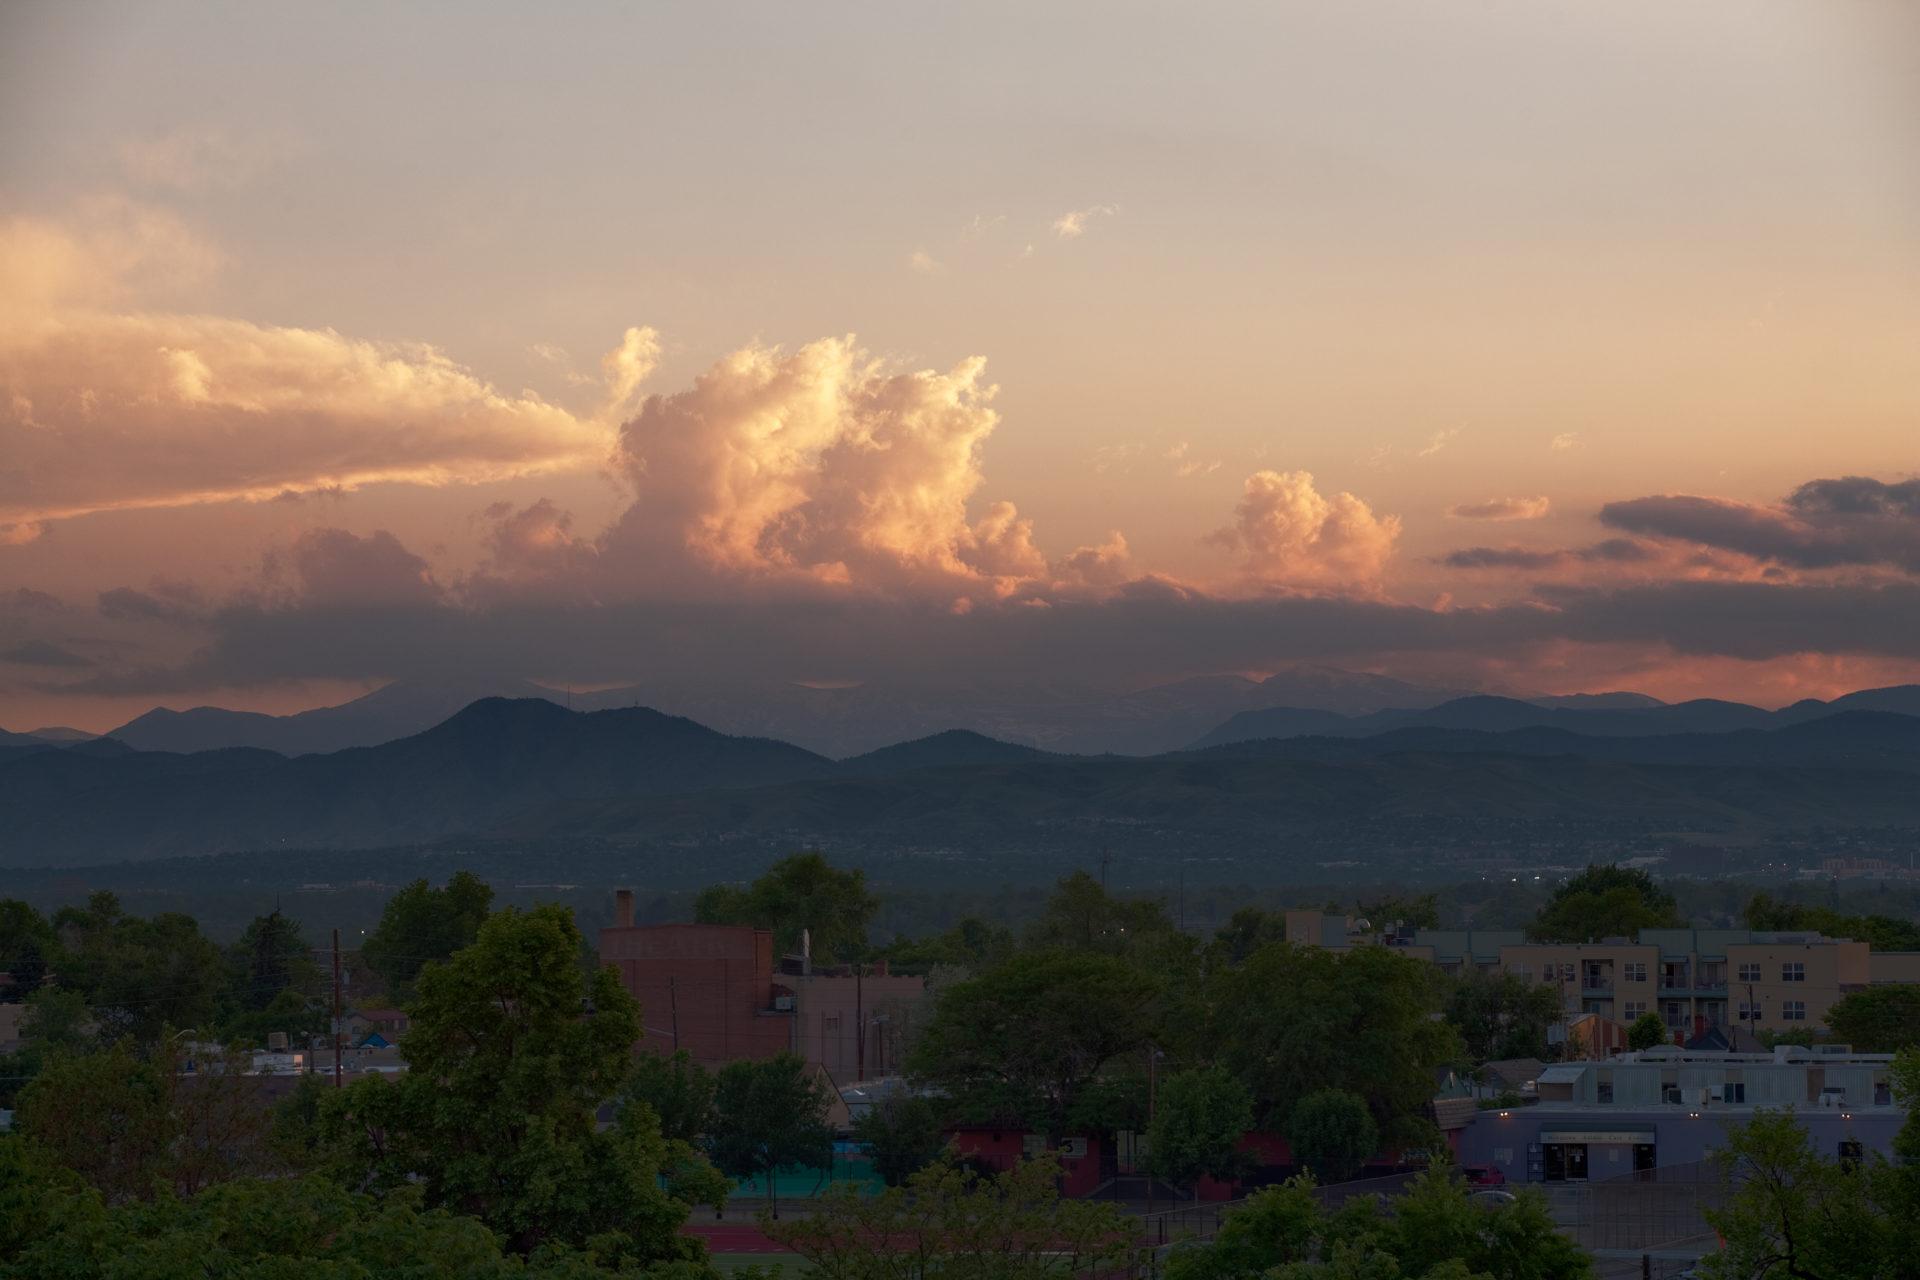 Mount Evans sunset - June 10, 2011